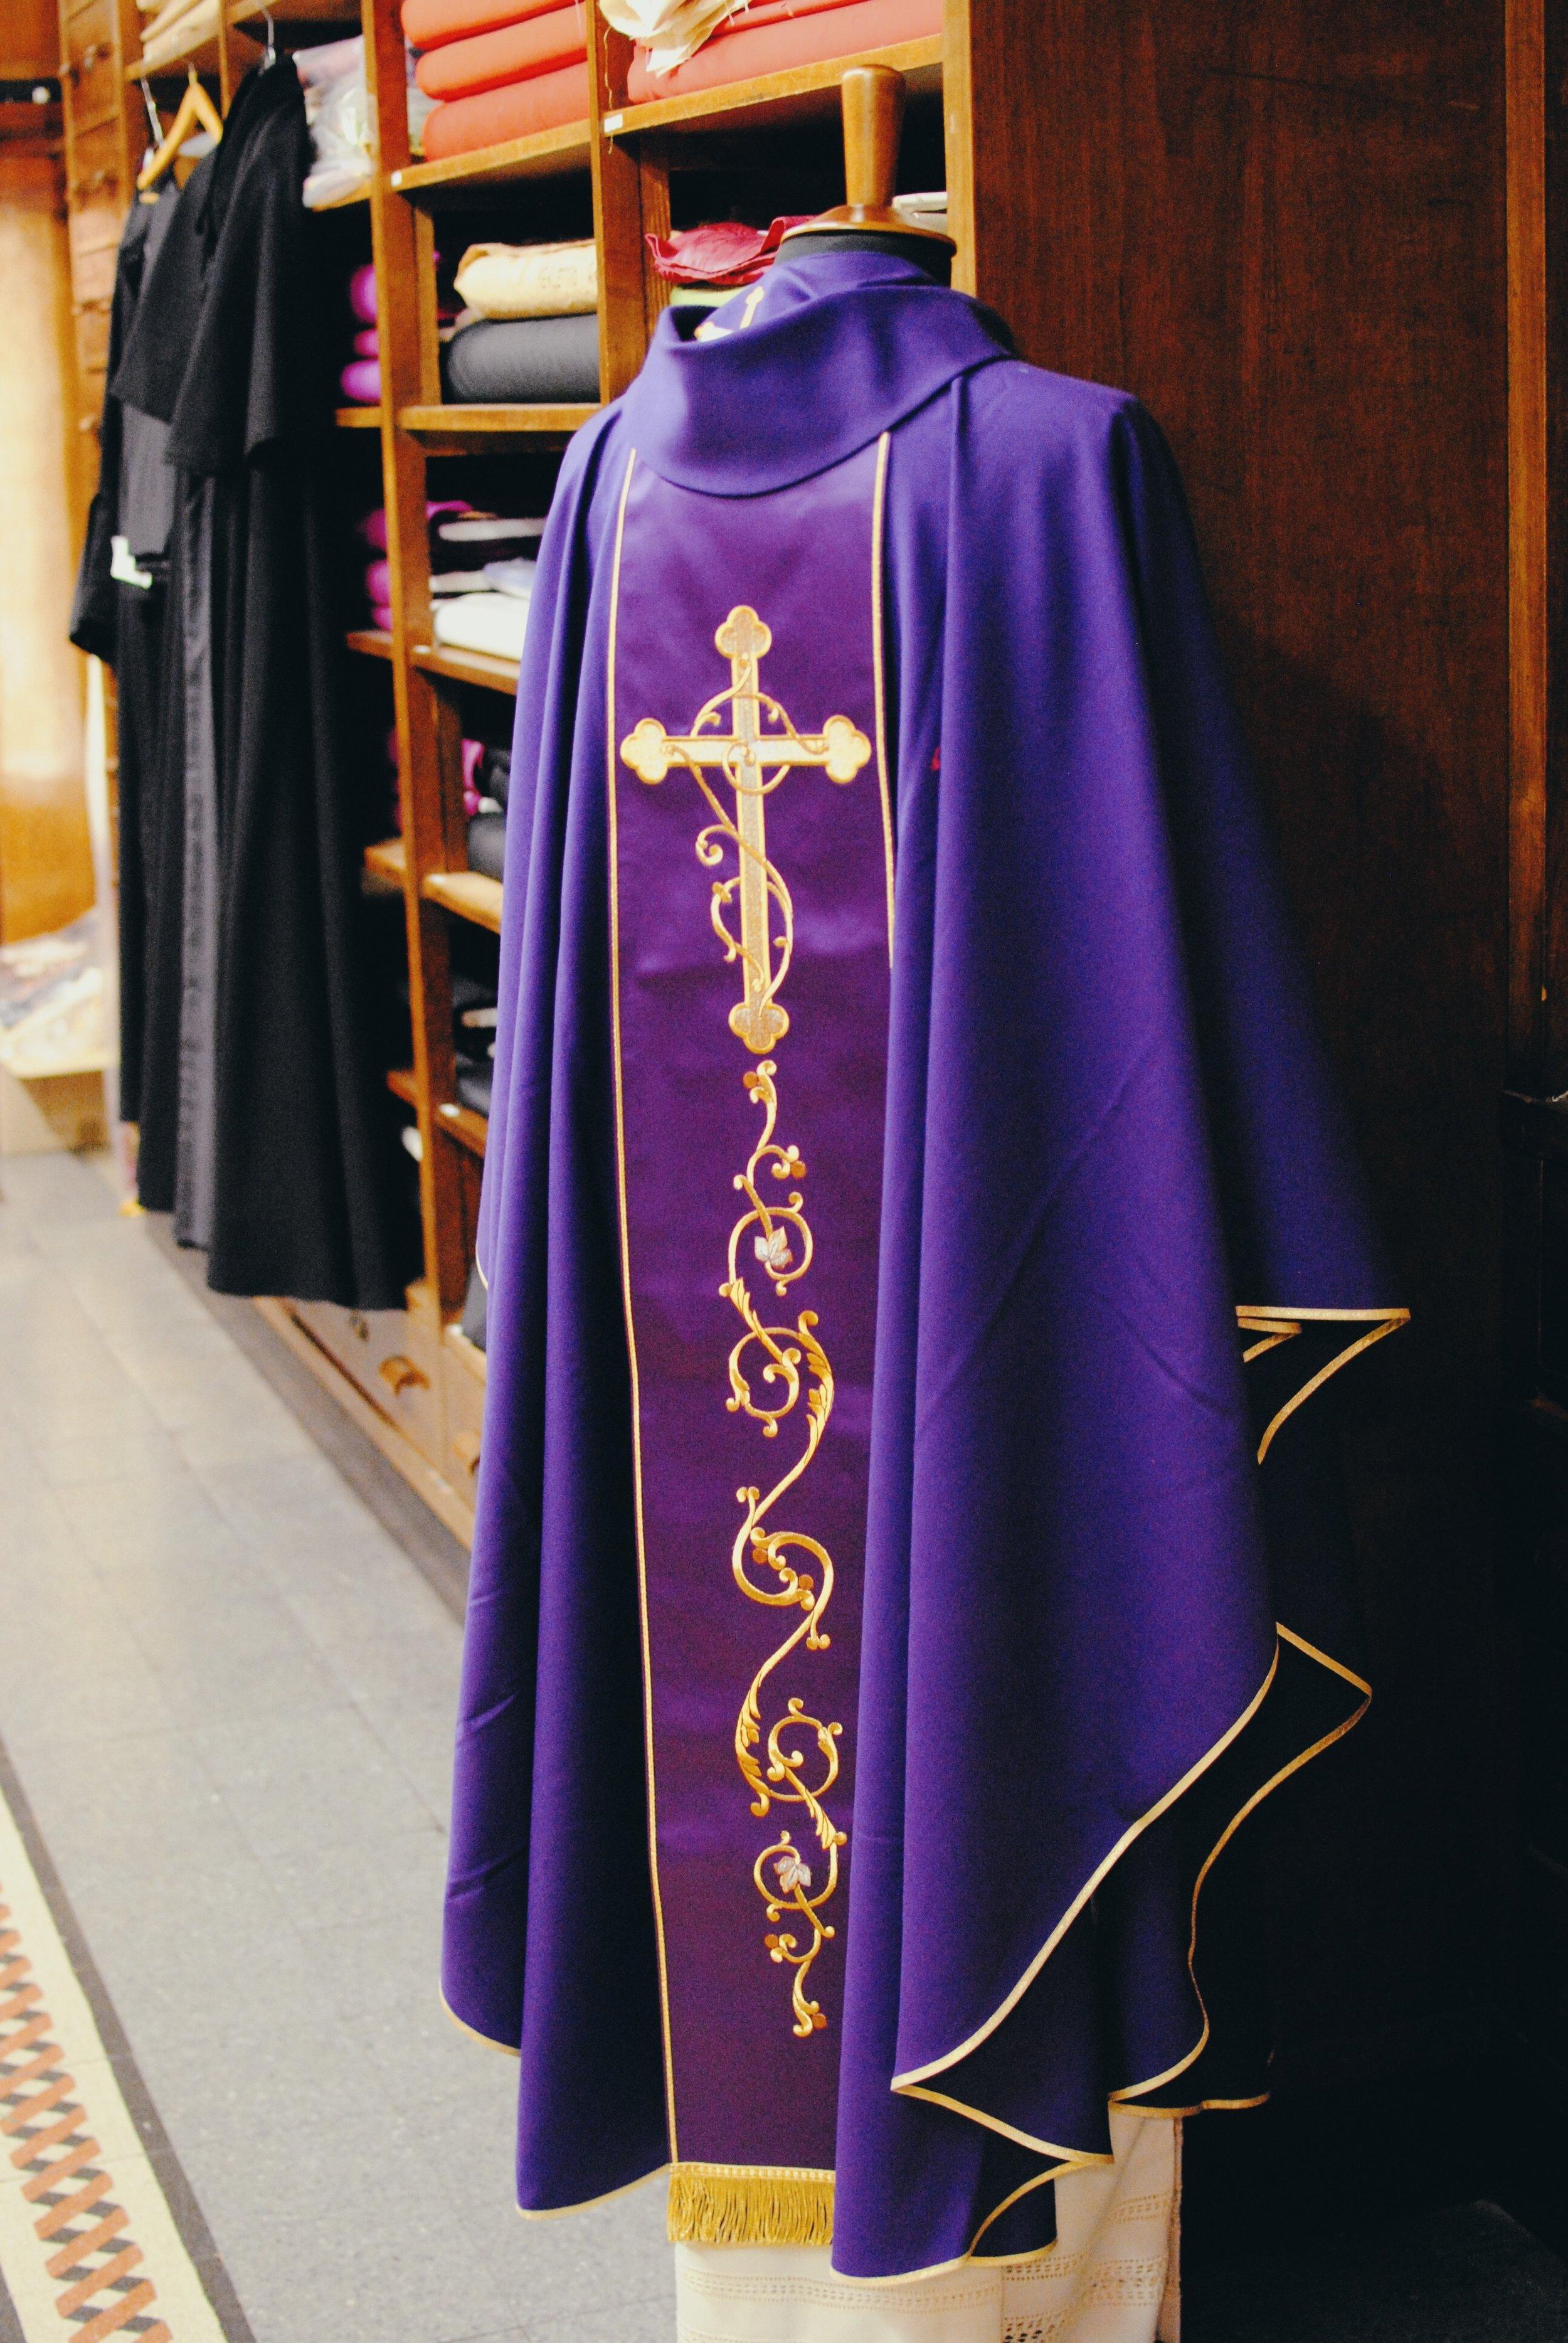 Gammarelli: A beautiful dark purple garment on display in the store.